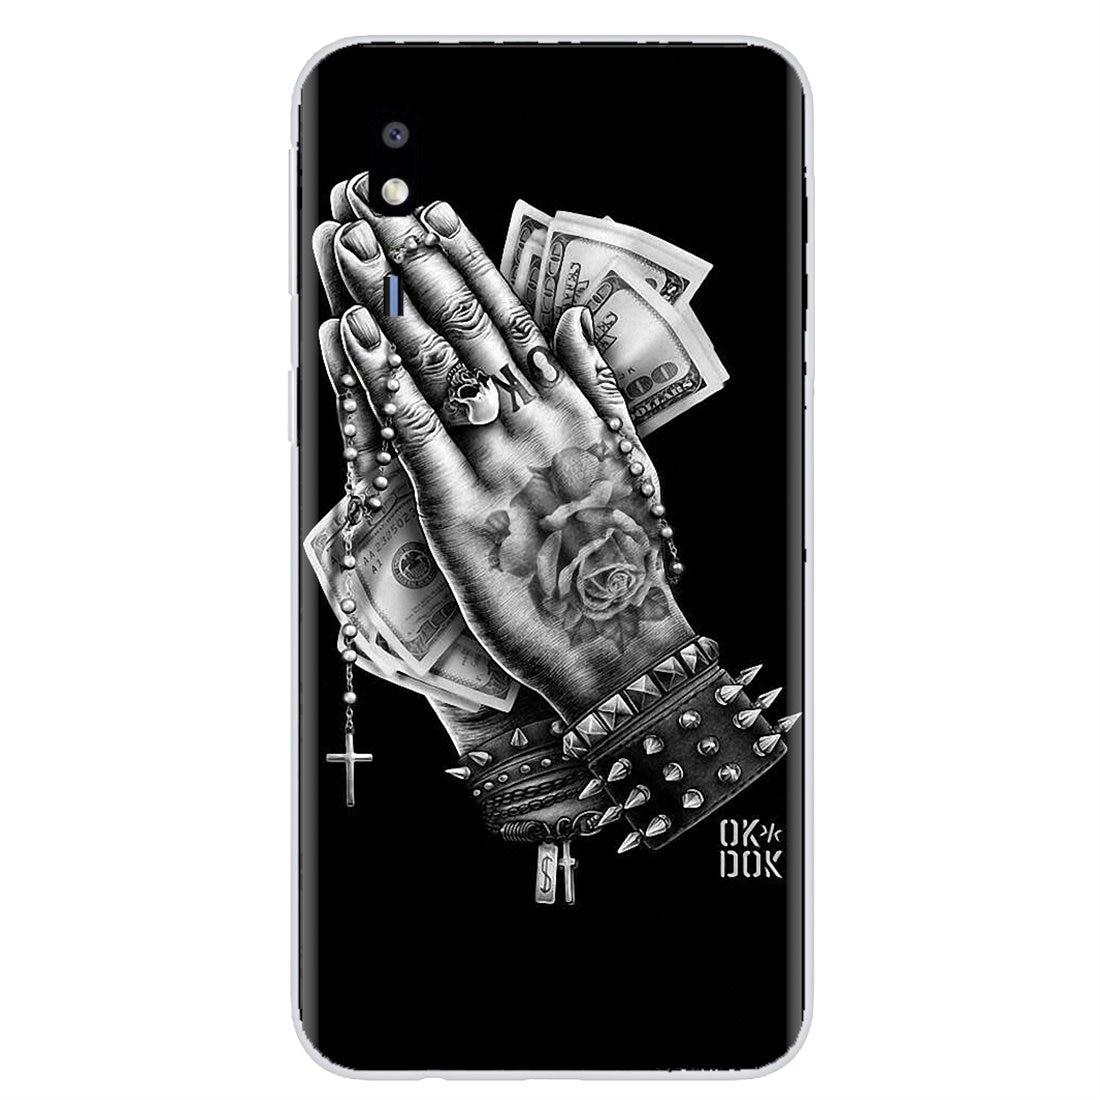 Teléfono inteligente, de silicona teléfono caso para Sony Xperia Z 3 Z Z1 Z2 Z3 Z5 XZ1 XZ2 compacto M2 M4 M5 C4 C6 E3 T3 Latina tengo este rezar